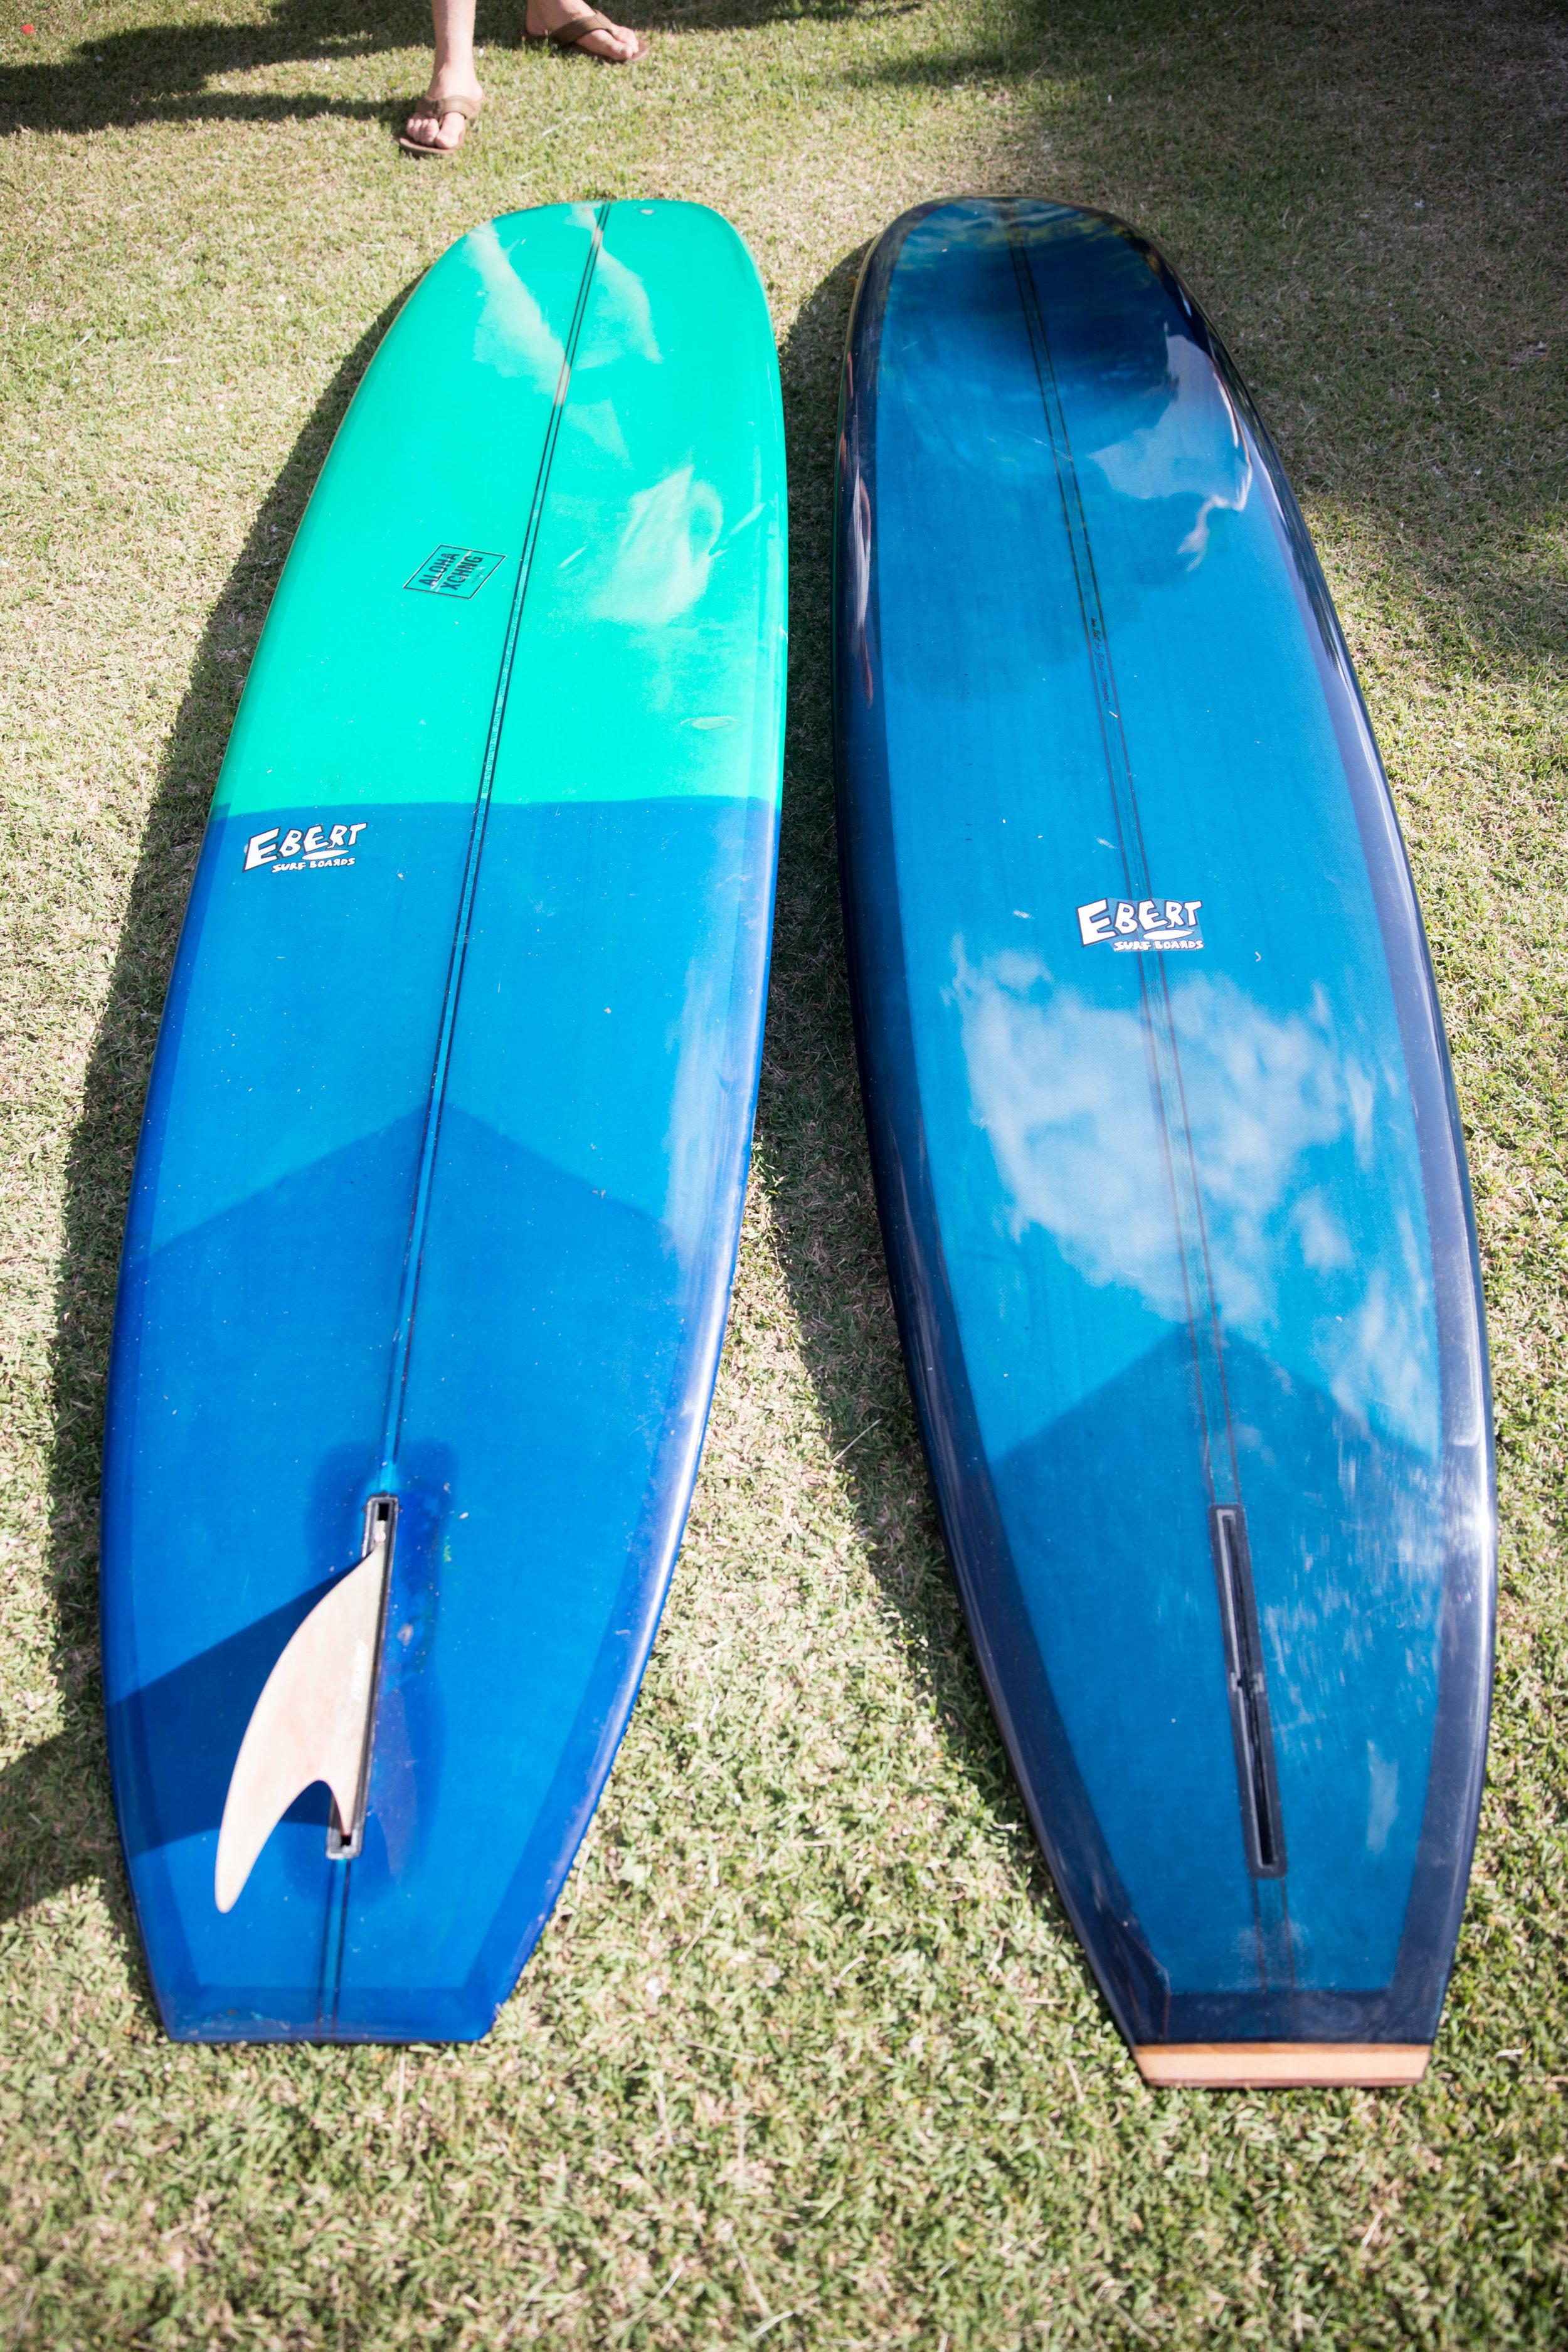 bryce johnson-photography-ebert surfboards-kauai-40.jpg